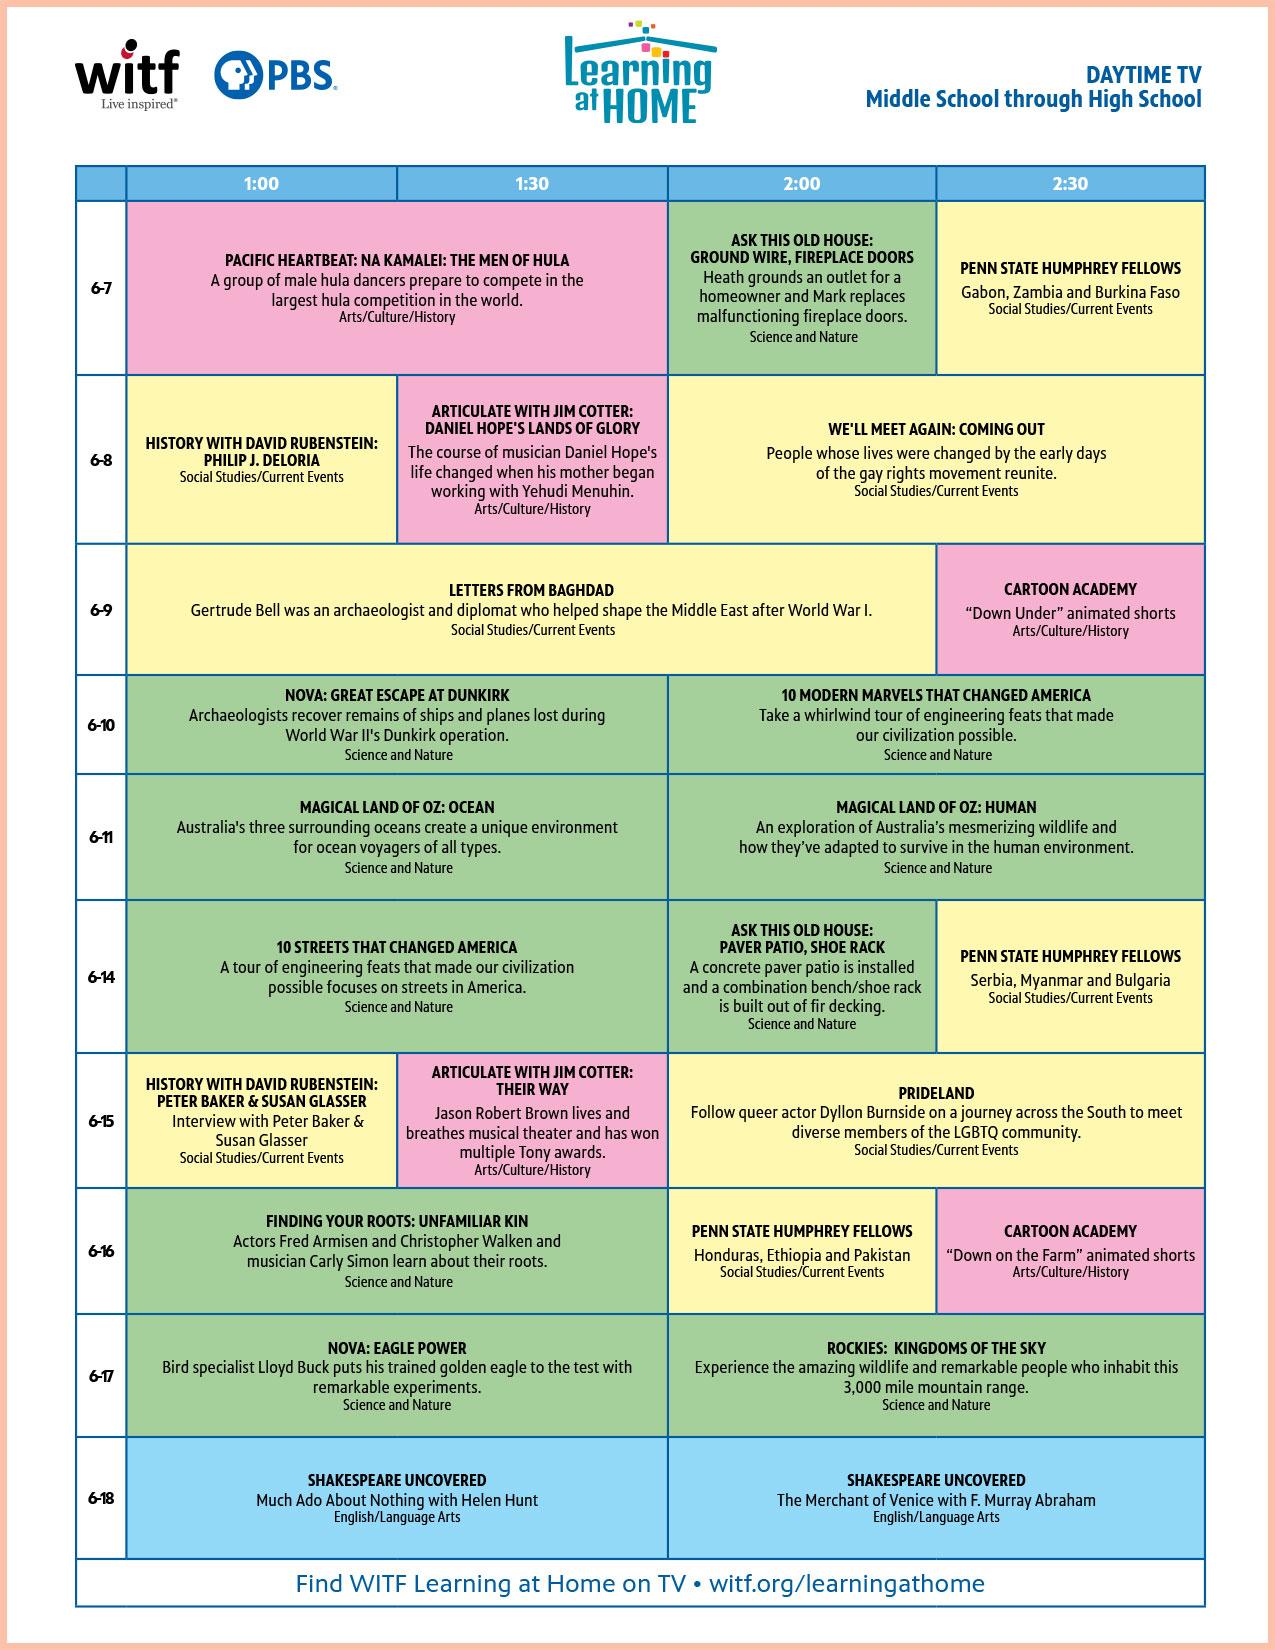 WITF Daytime Schedule | Middle School through High School